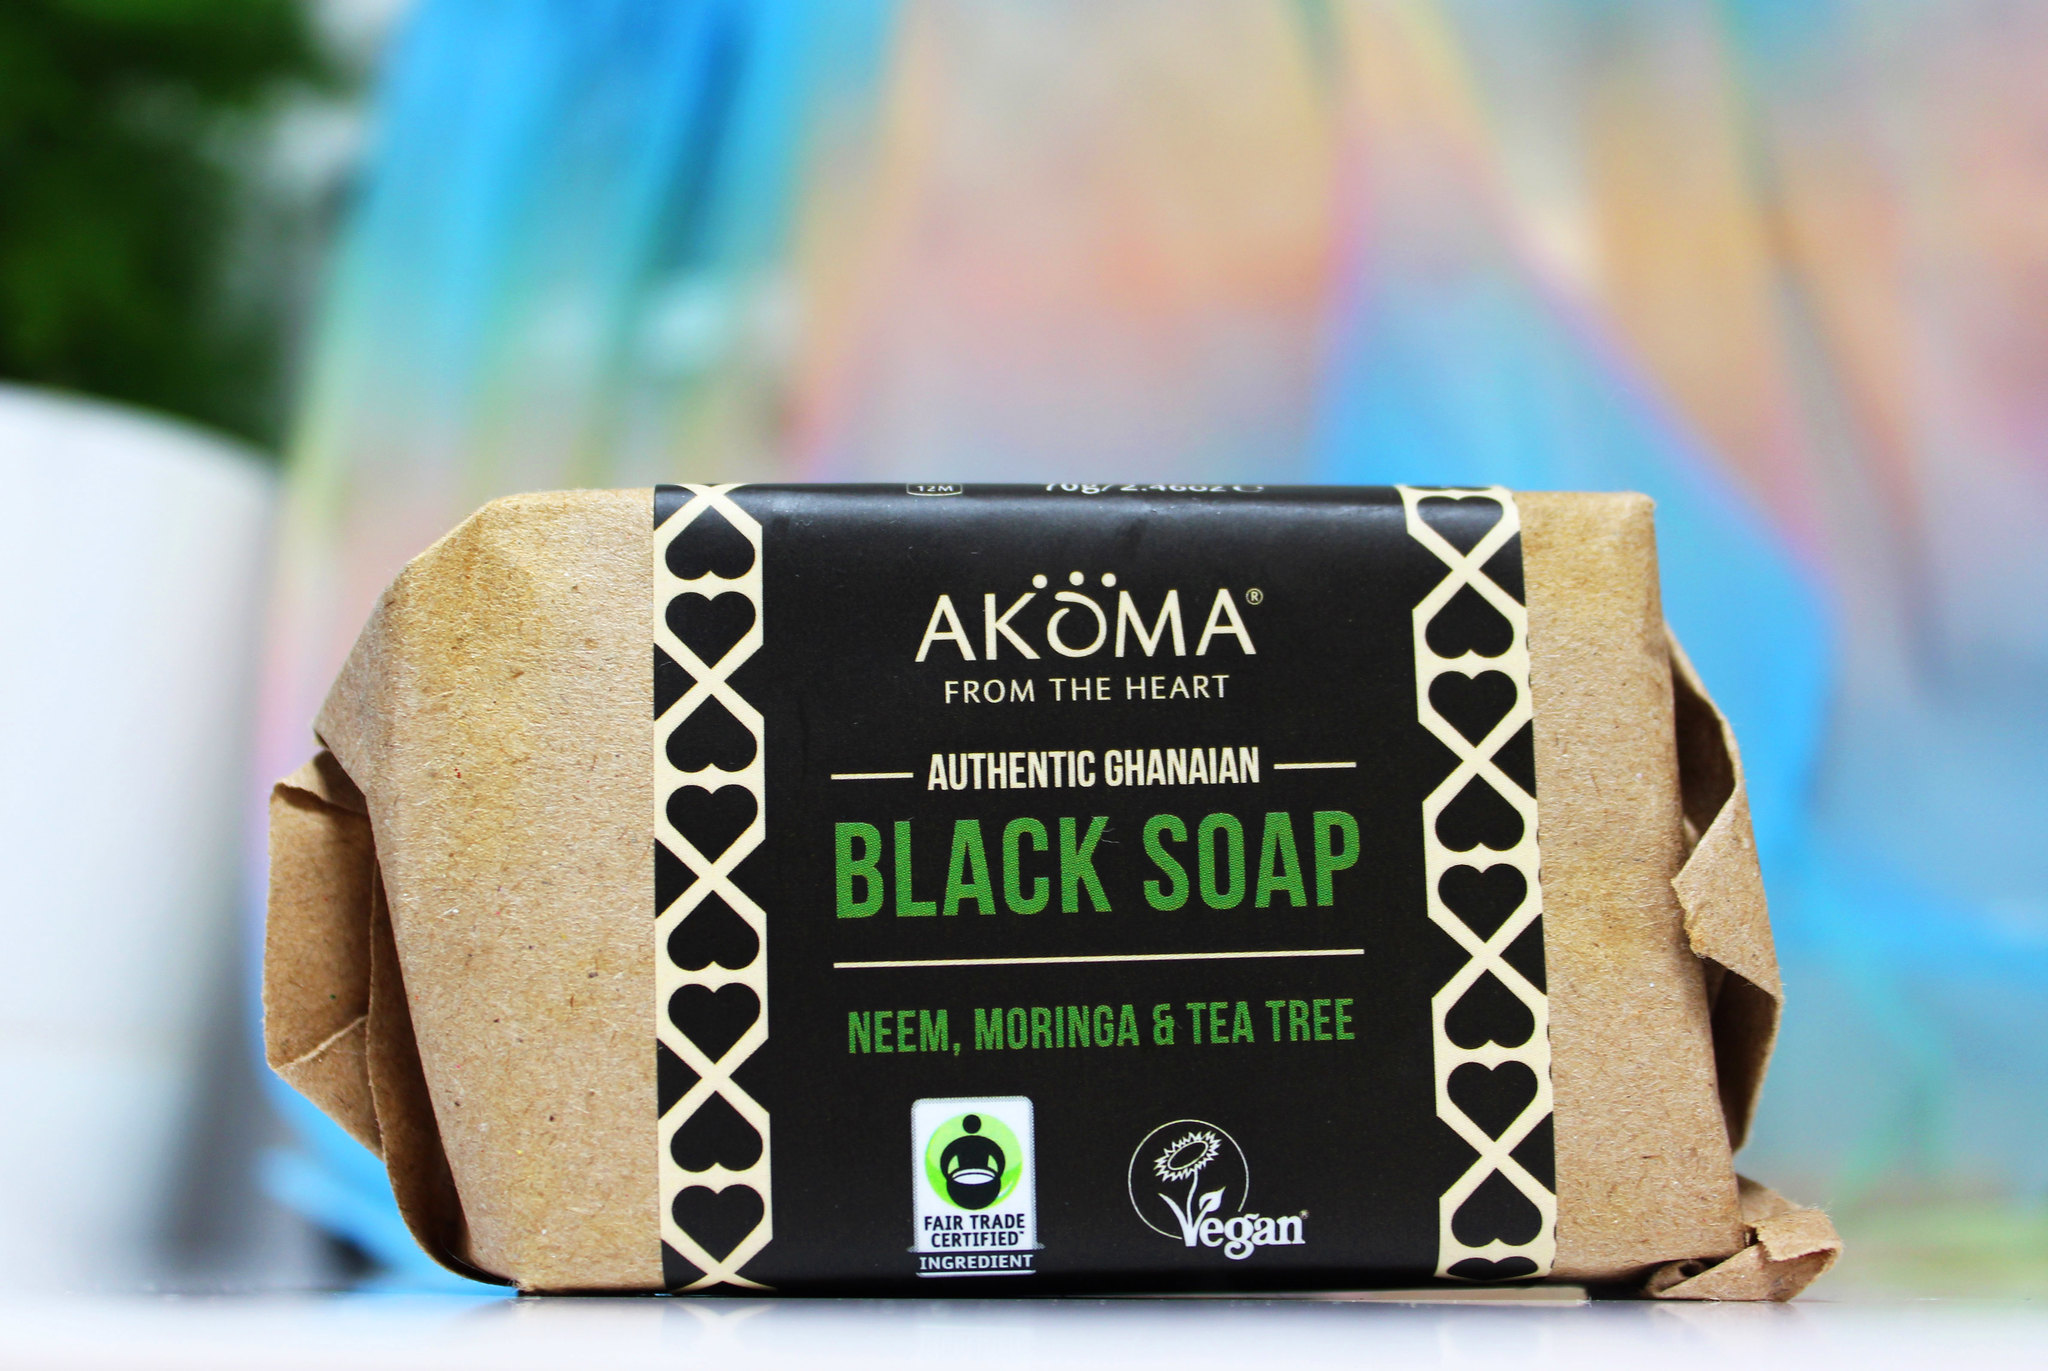 Akoma black soap